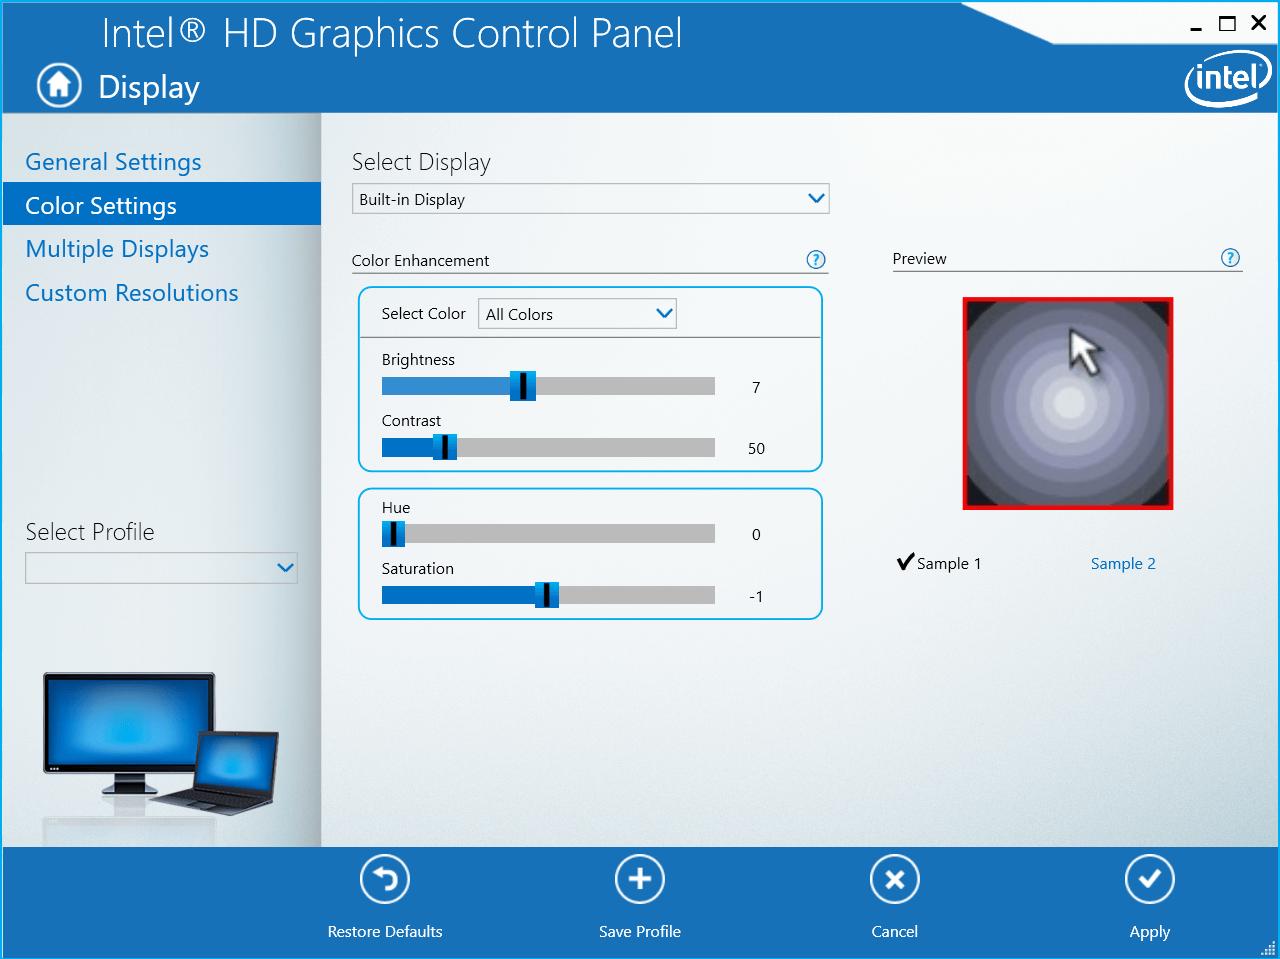 Adjust the Brightness slider under Color Settings then click Apply